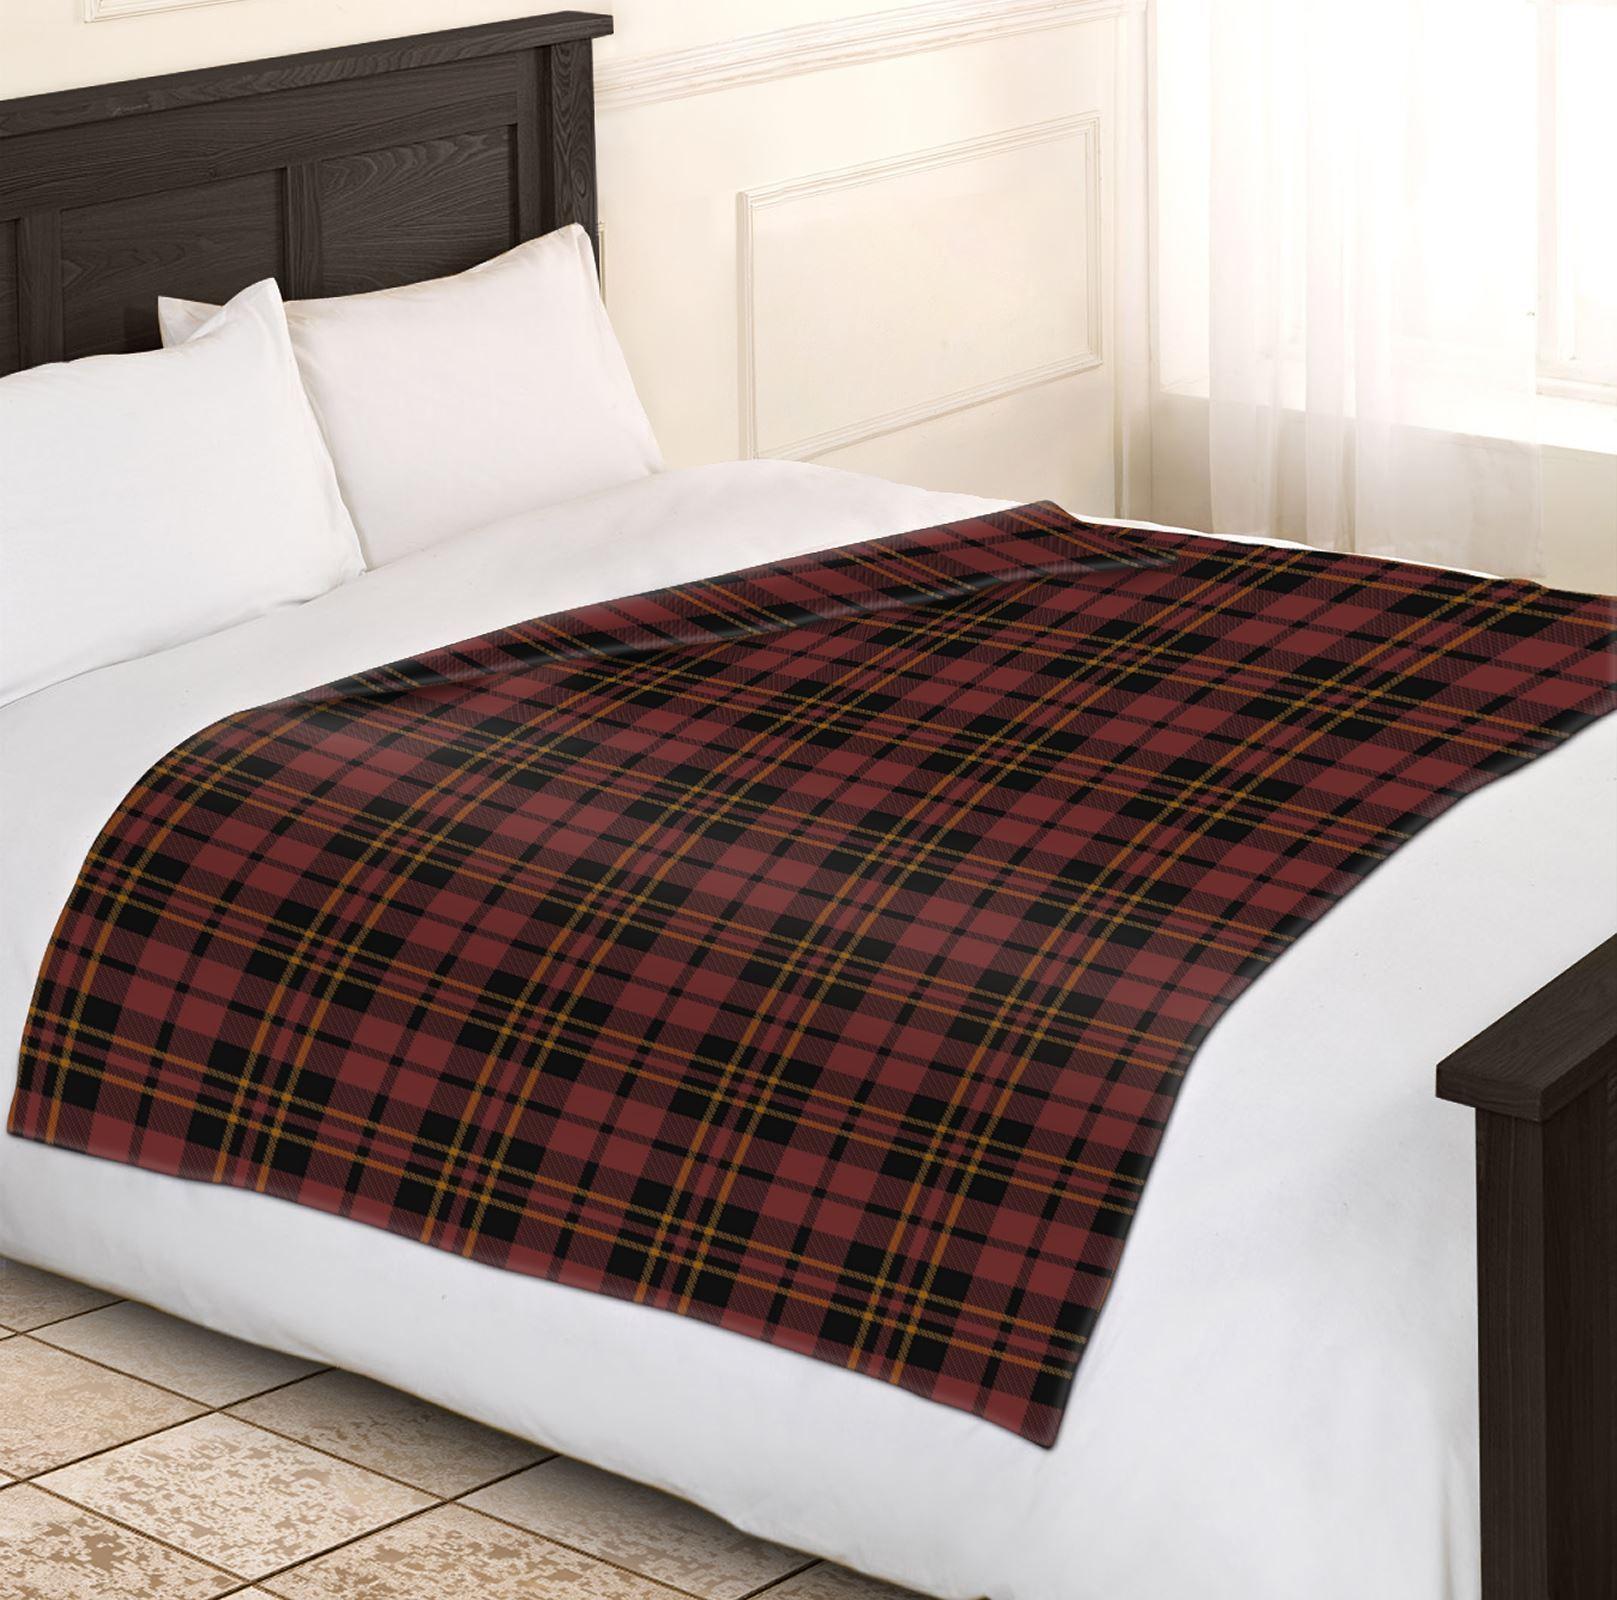 Soft-Warm-Check-Blanket-Brown-Single-Double-King-Tartan-Sofa-Throw-Bed-Fleece thumbnail 7